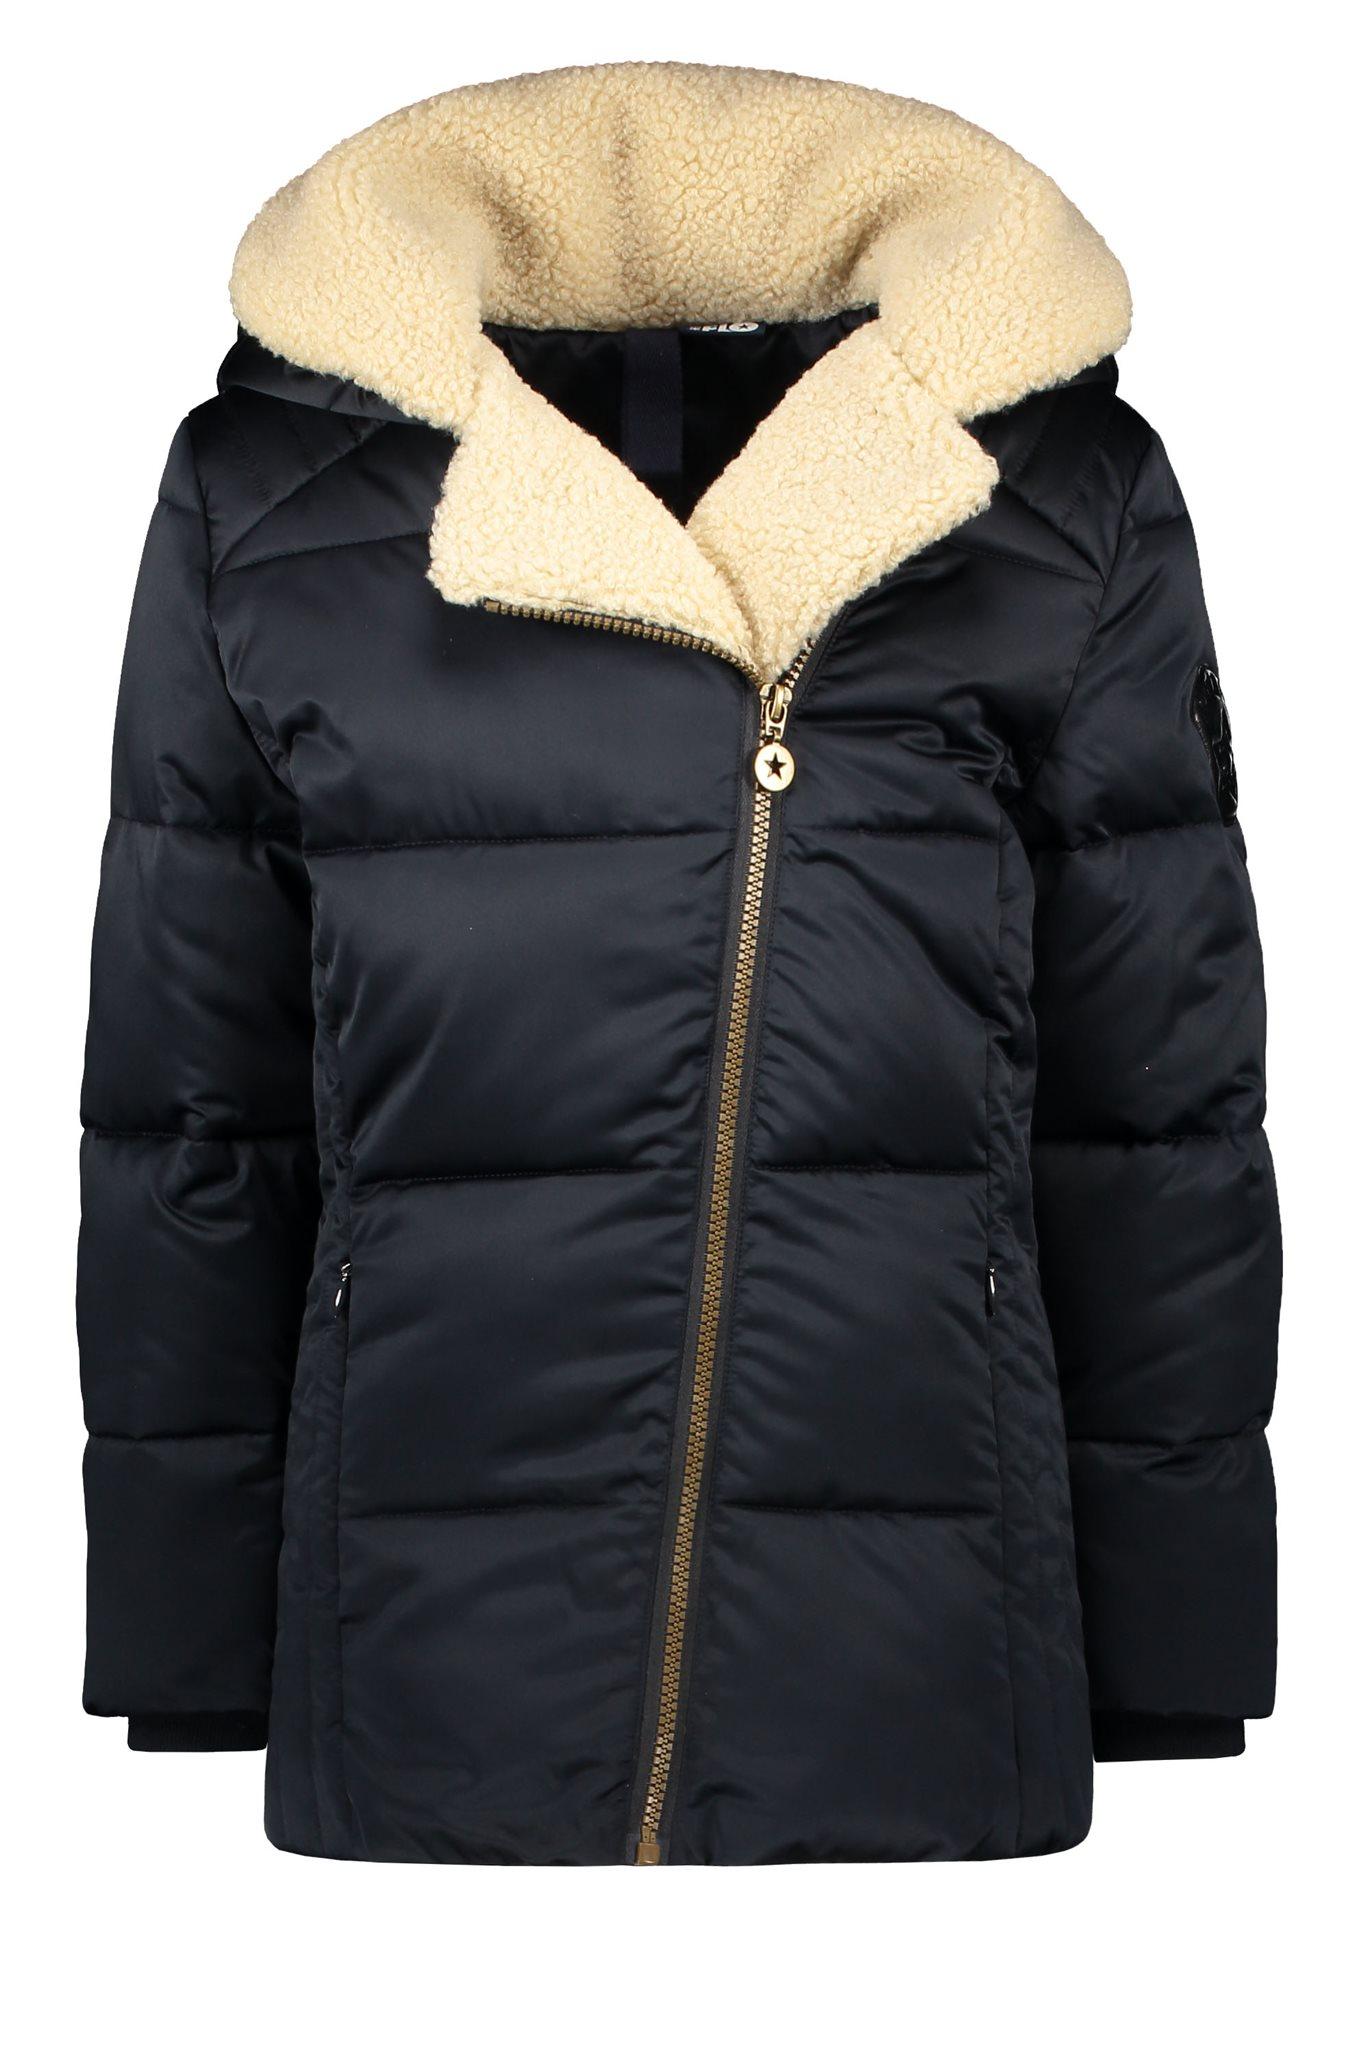 Flo jas donkerblauw